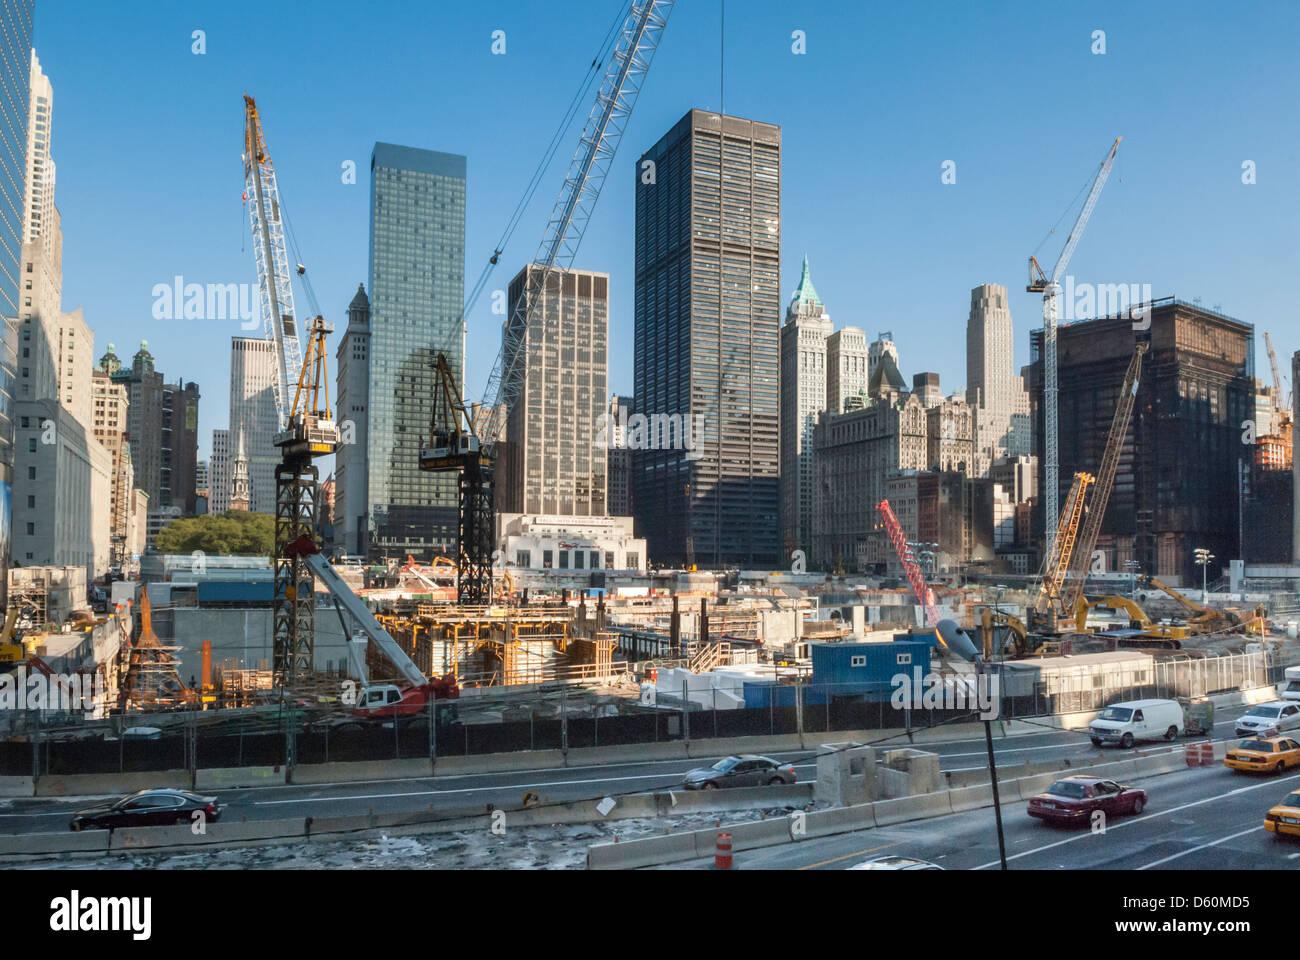 New york city free dating site